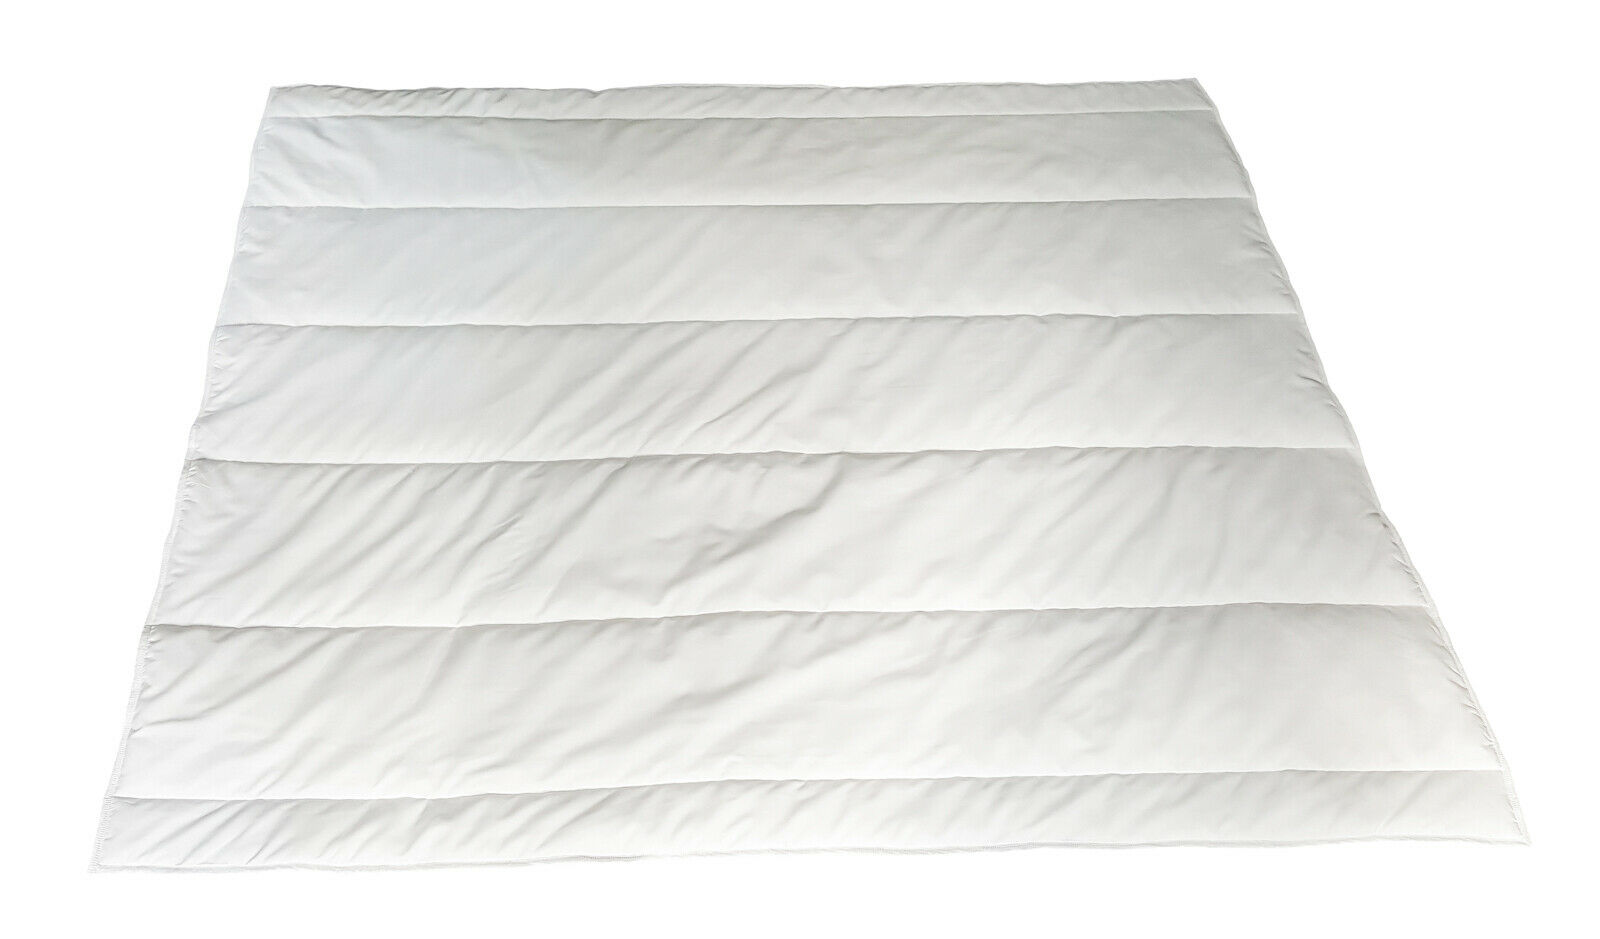 SALE IKEA Blanket Duvet Len Summer Lightweight Blanket Baby 110 x 125cm